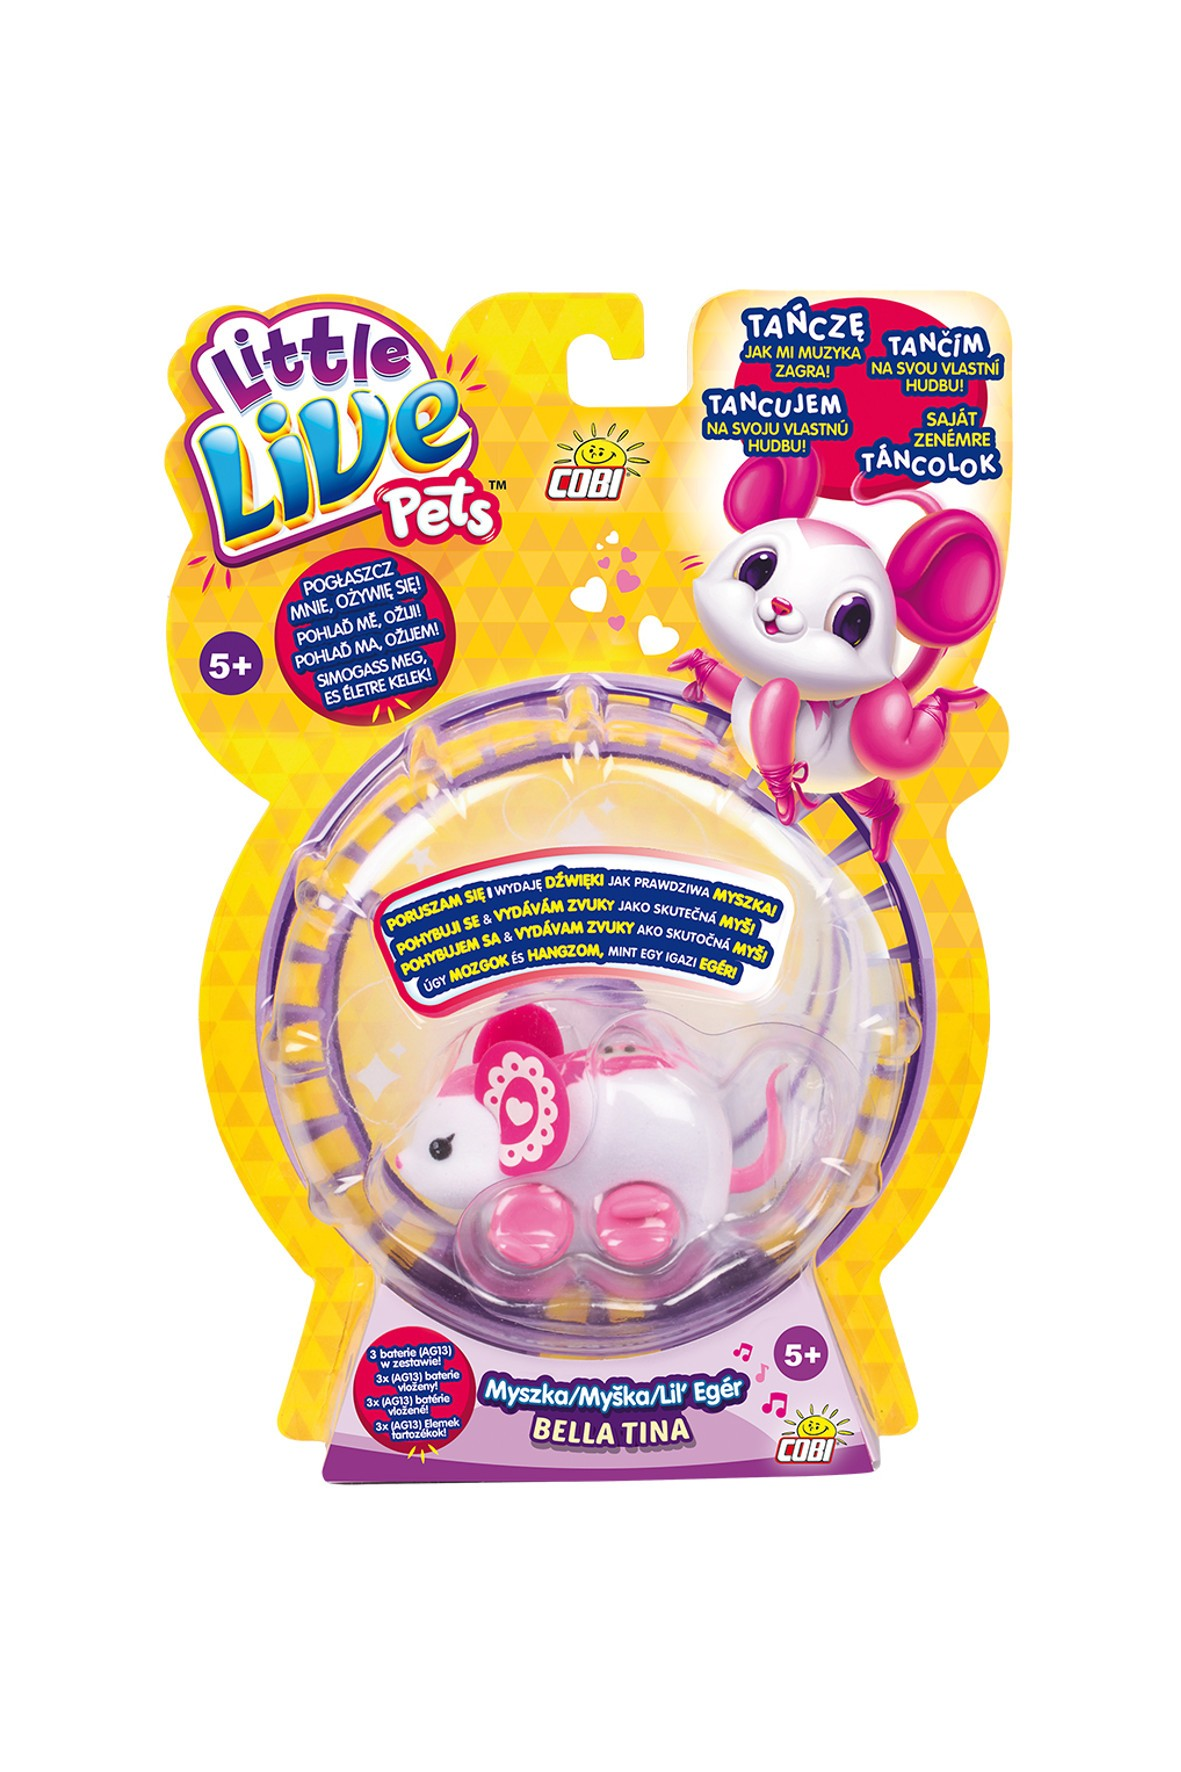 Little Live Pets- Myszka